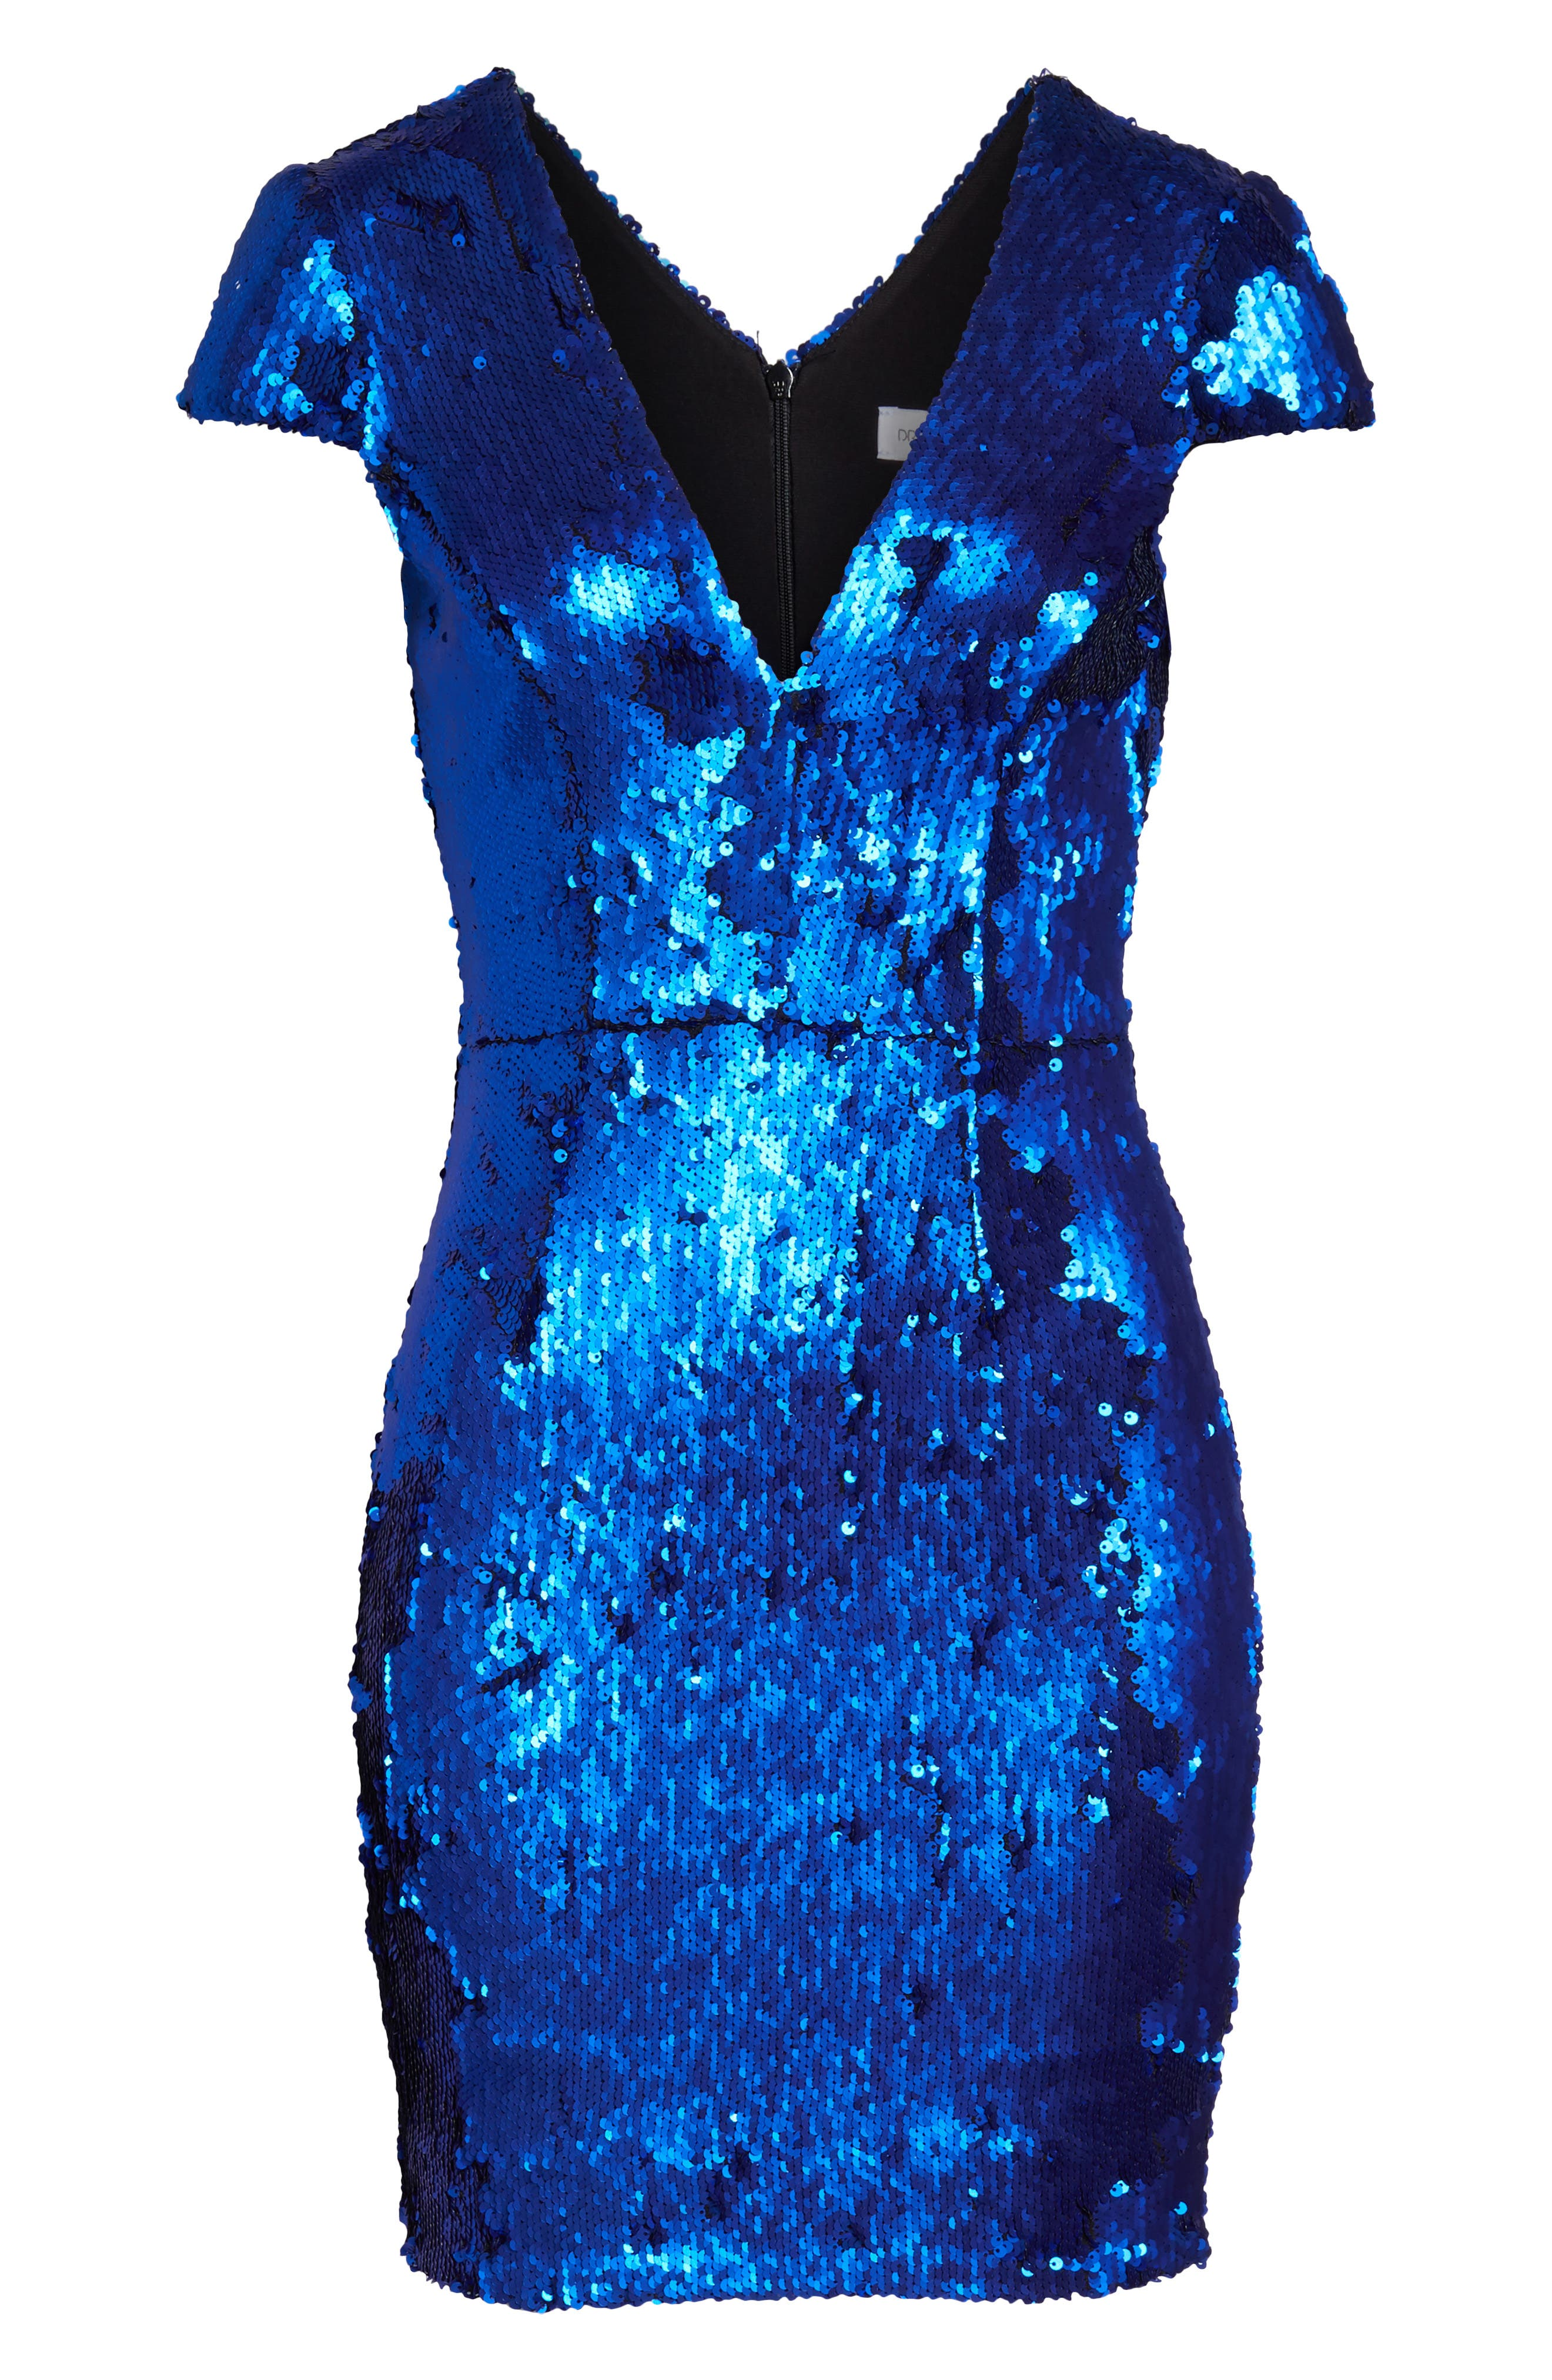 Zoe Sequin V-Neck Cocktail Sheath Dress,                             Alternate thumbnail 7, color,                             ELECTRIC BLUE